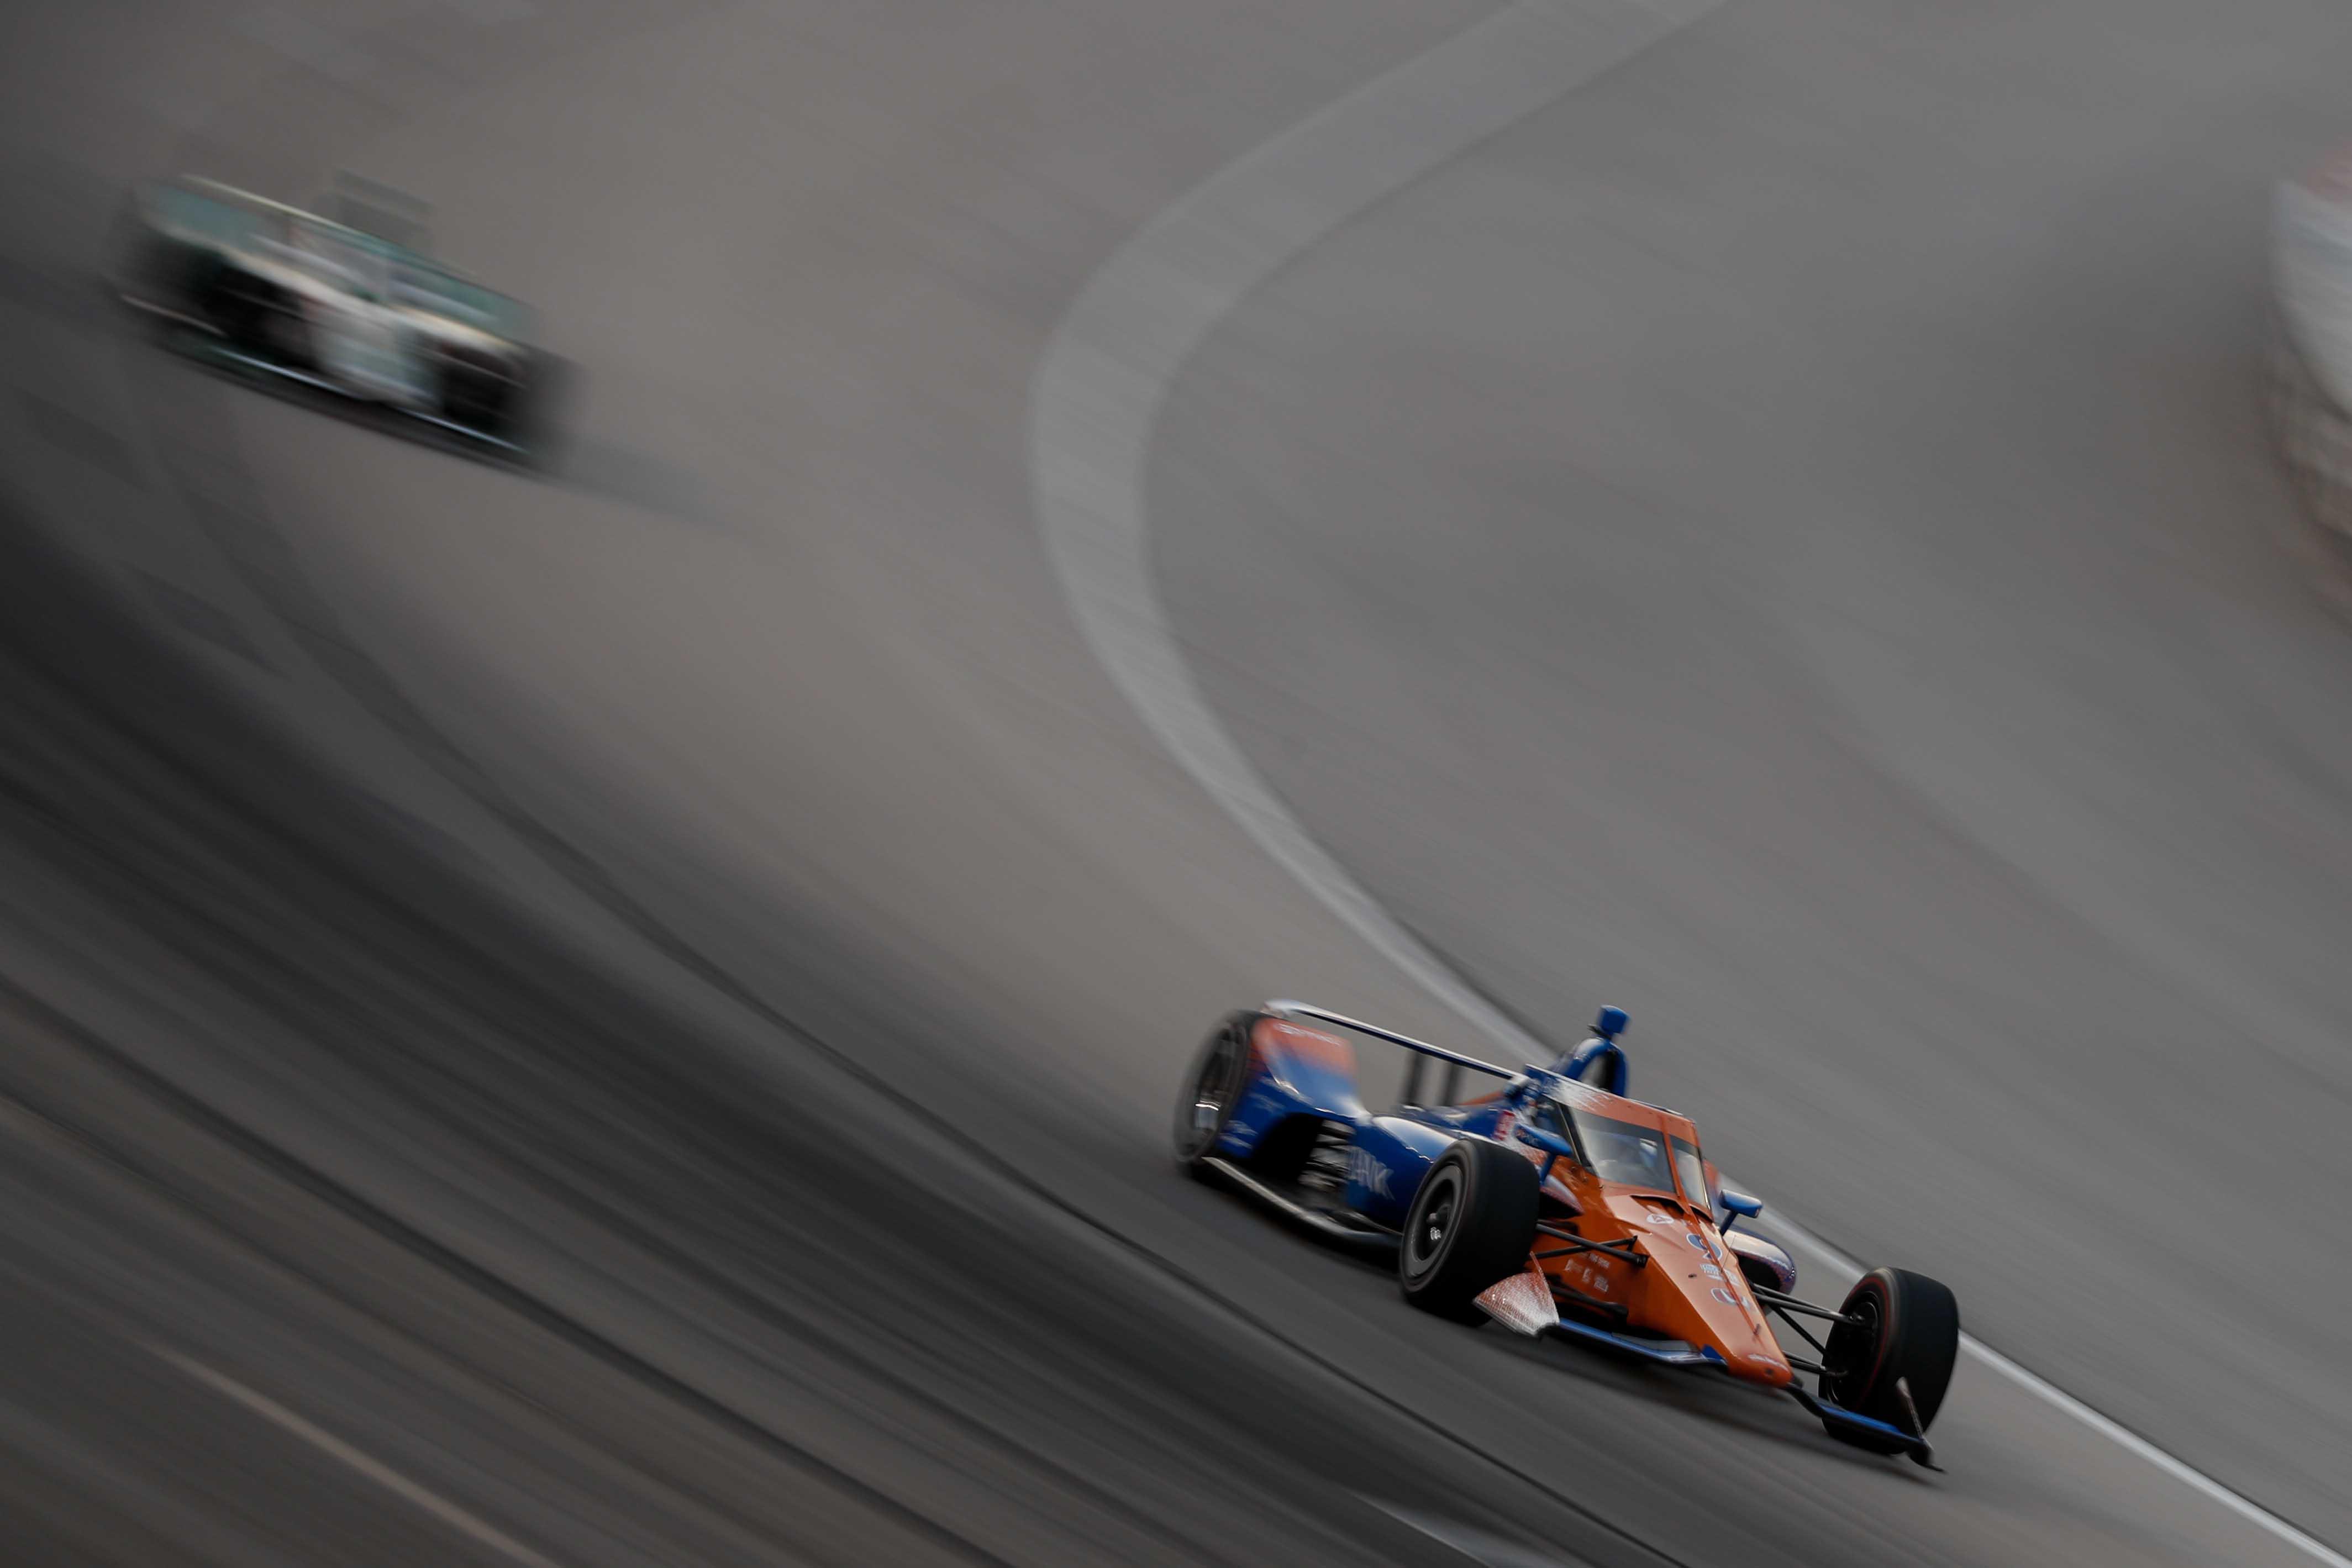 Scott Dixon at Texas Motor Speedway - Indycar Series